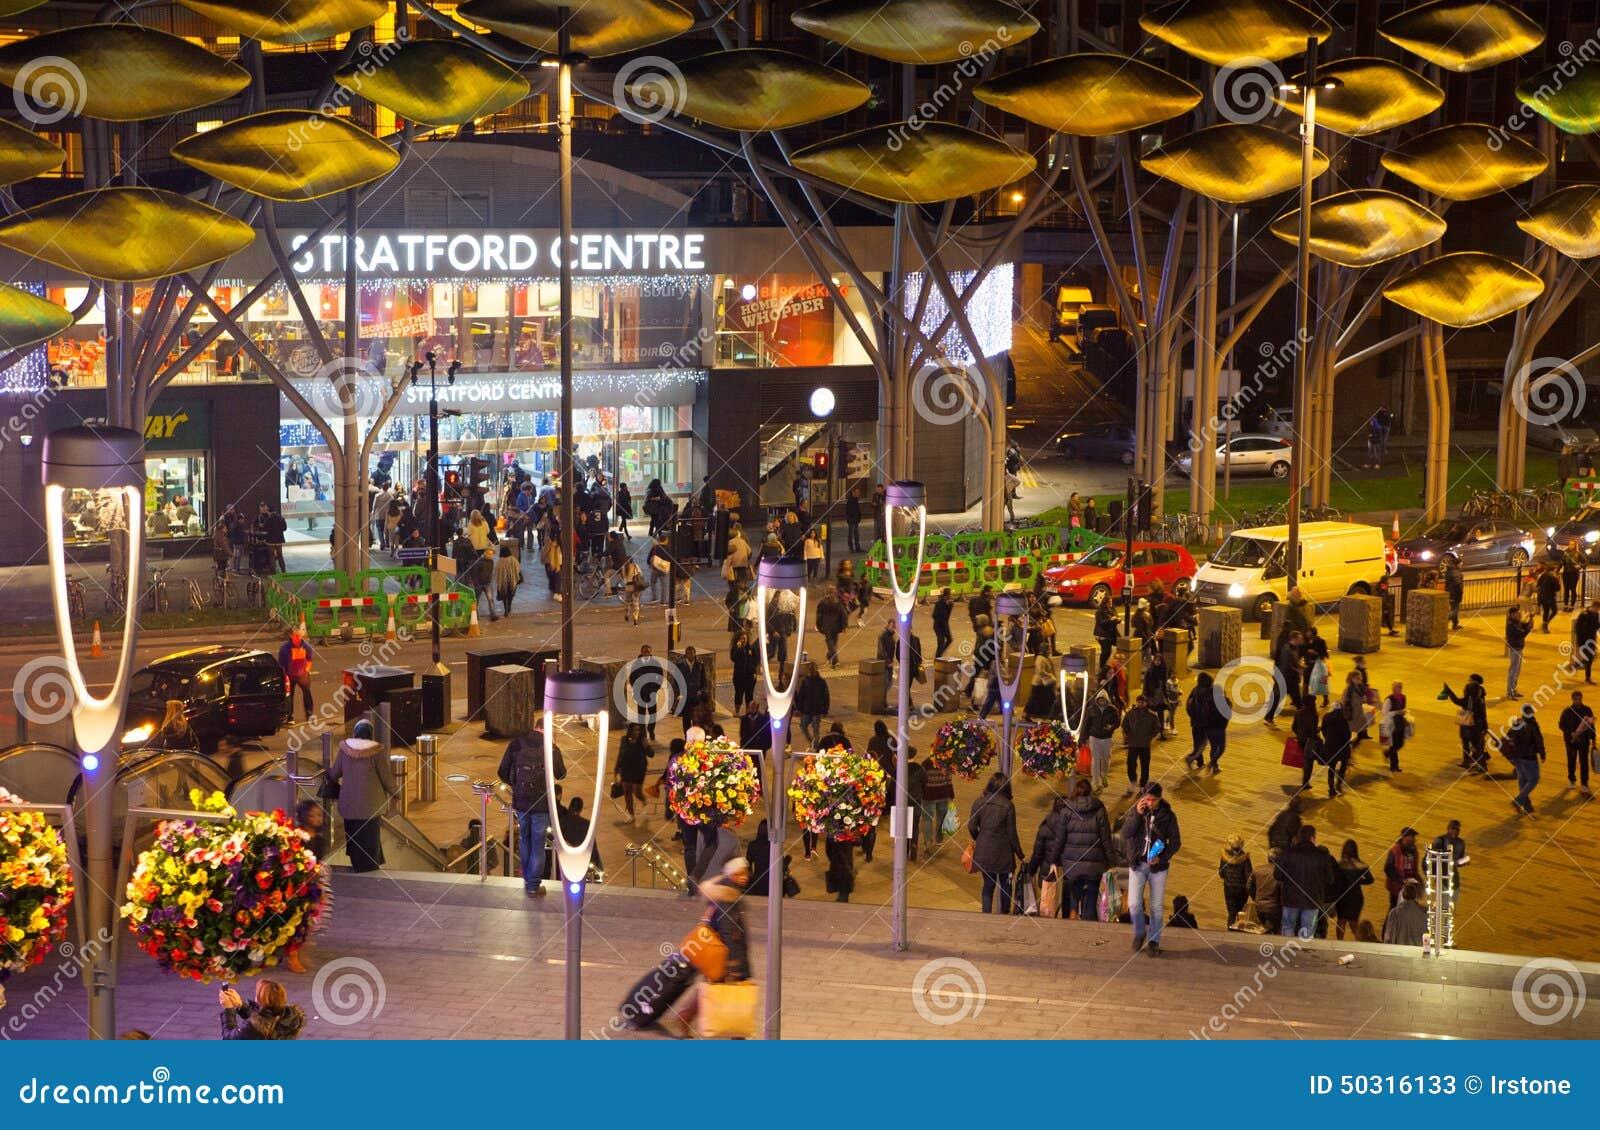 Stratford village shopping centre, London